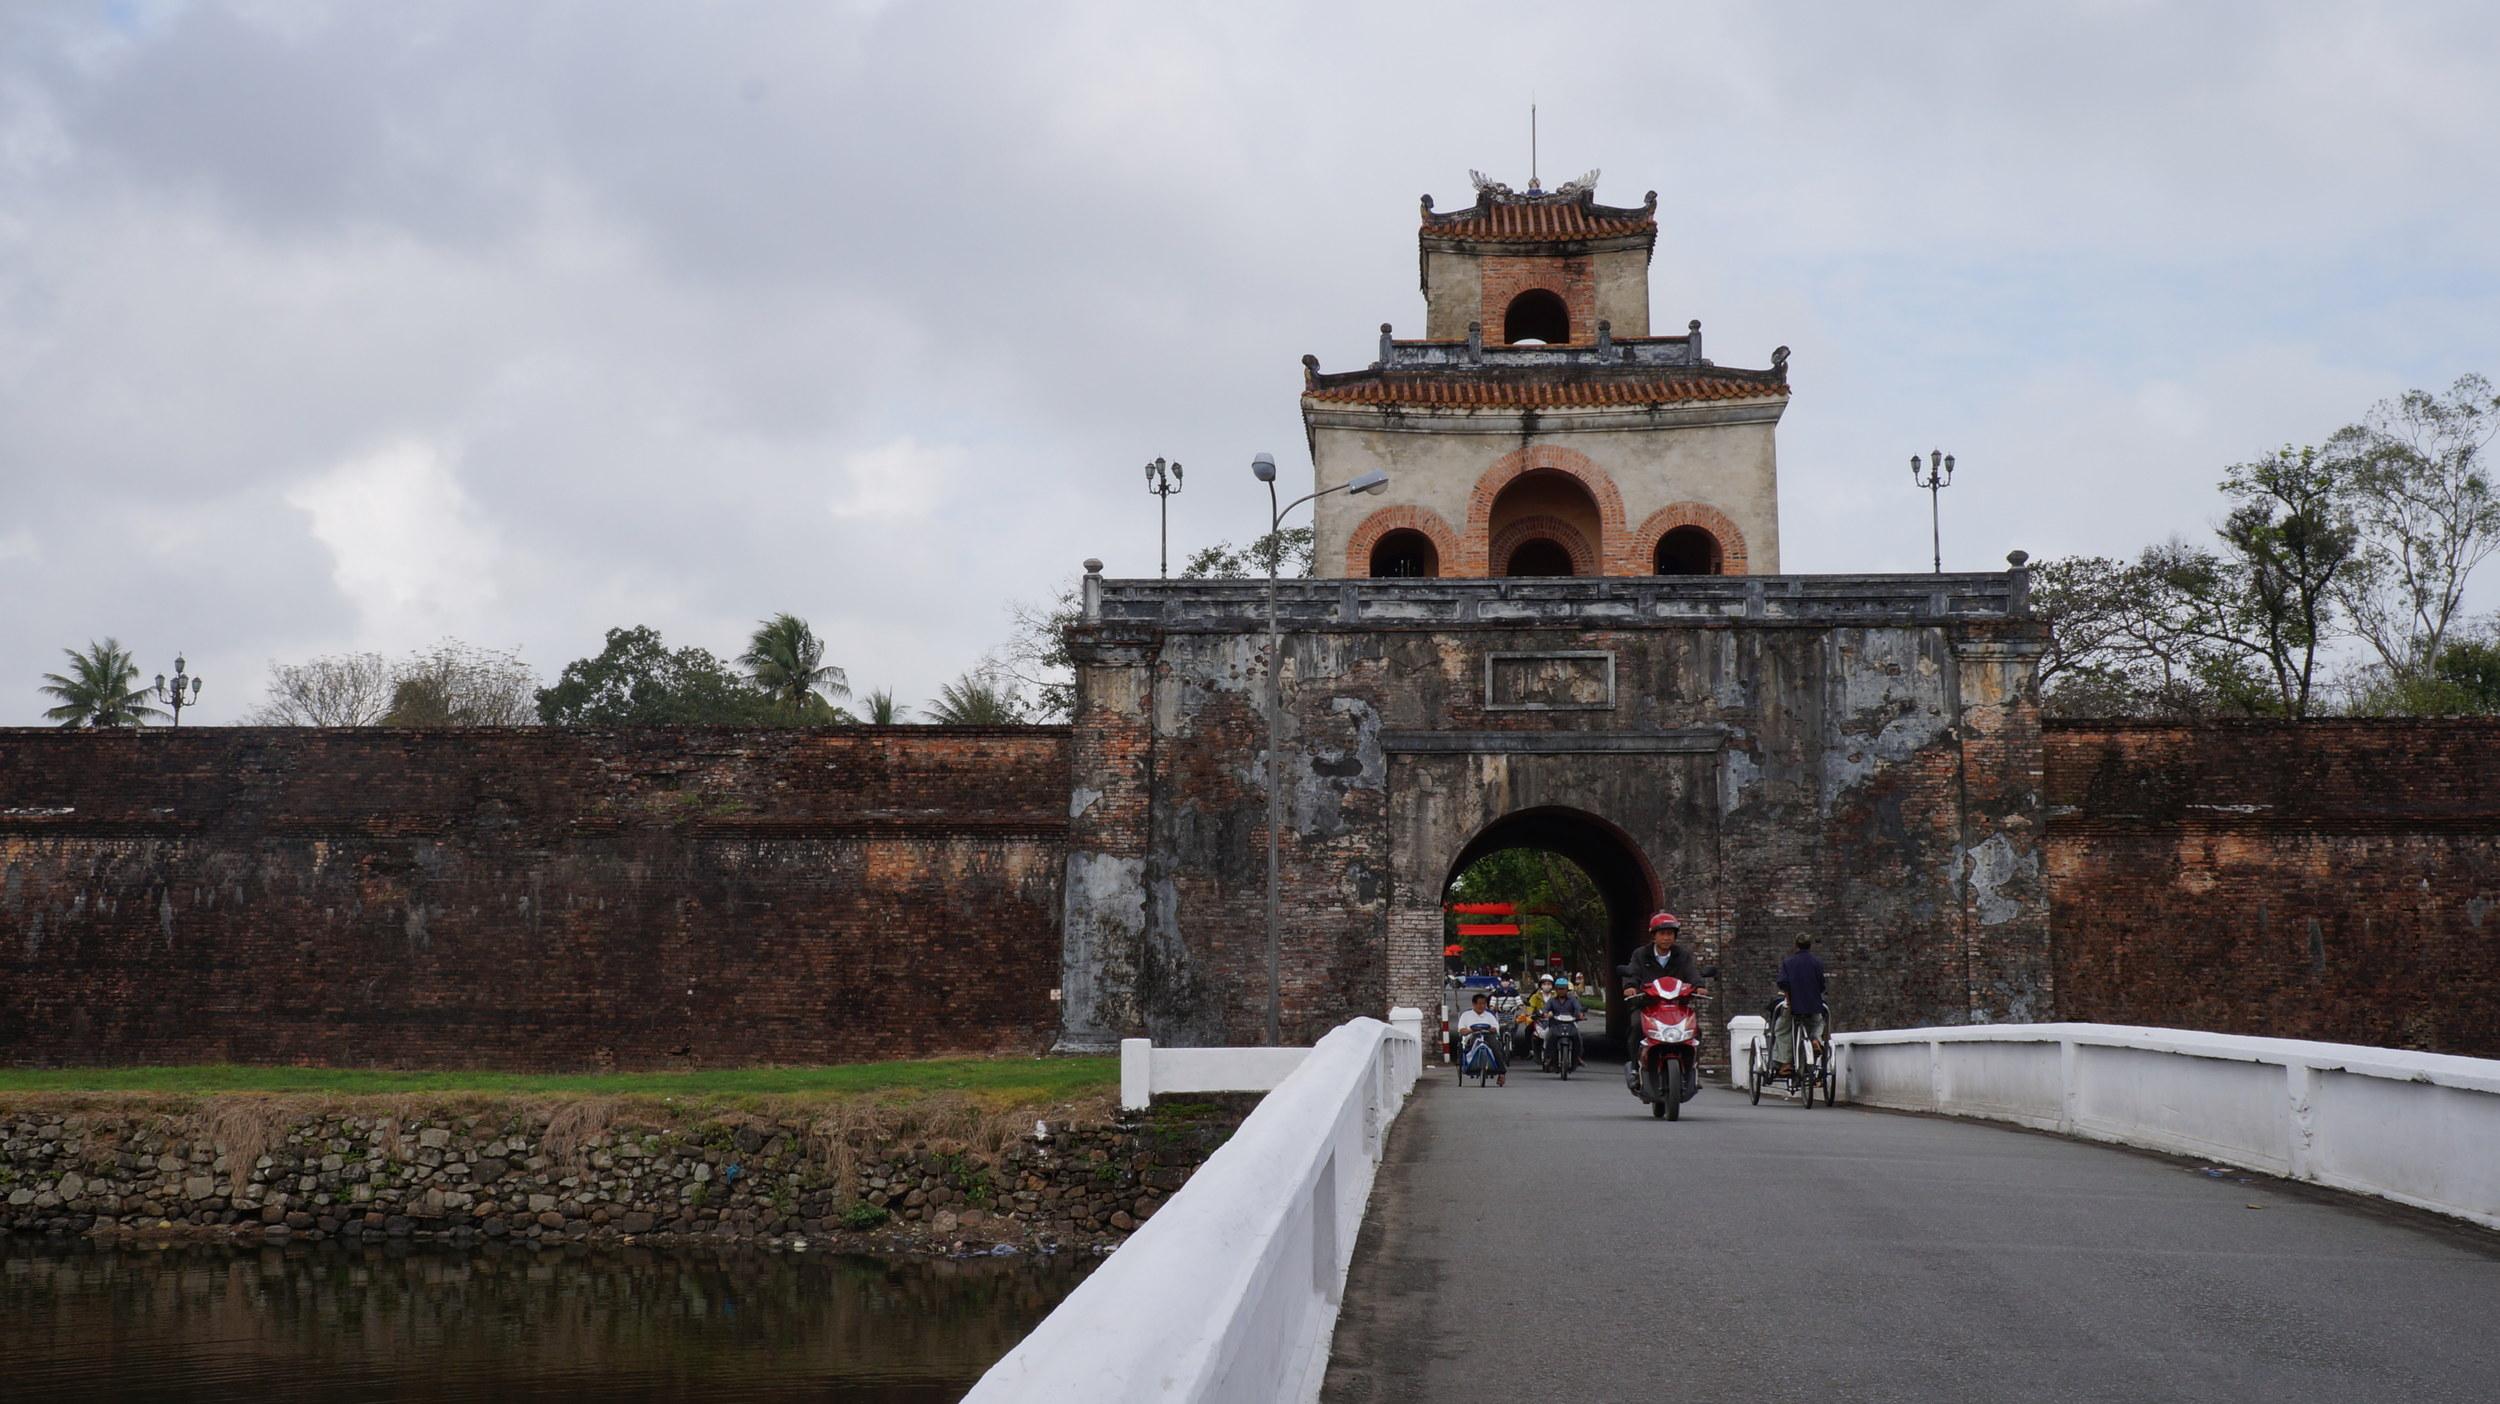 Bridge over the moat surrounding The Citadel in Hue